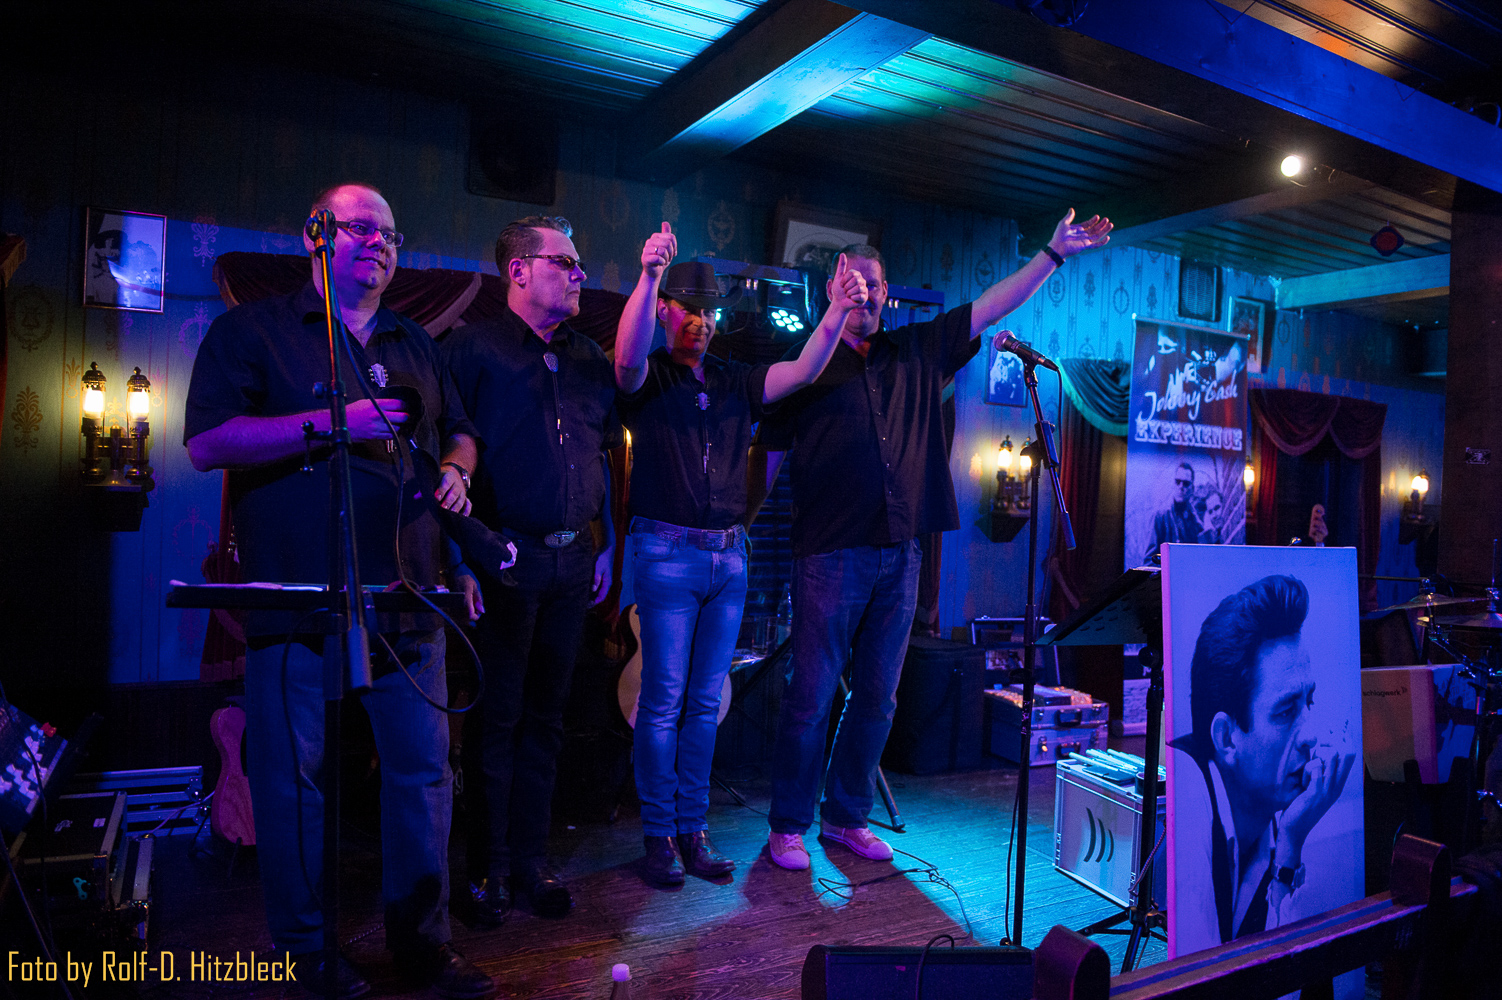 Johnny Cash Experience spielt am 13.09.2014 im Yukon Saloon